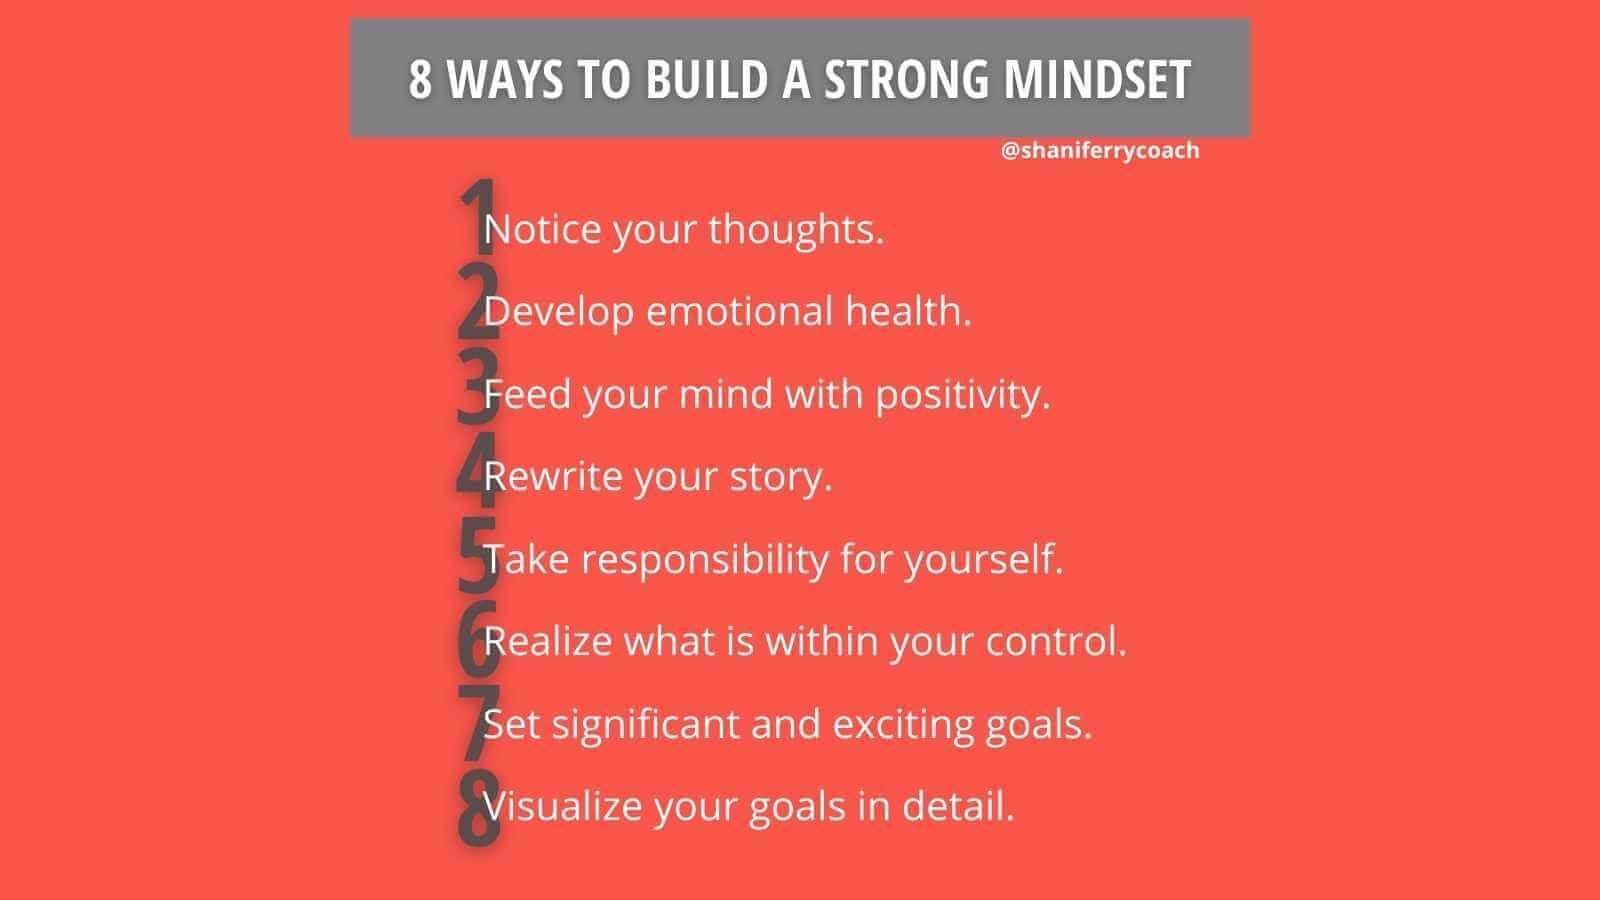 8 Ways to build strong mindset